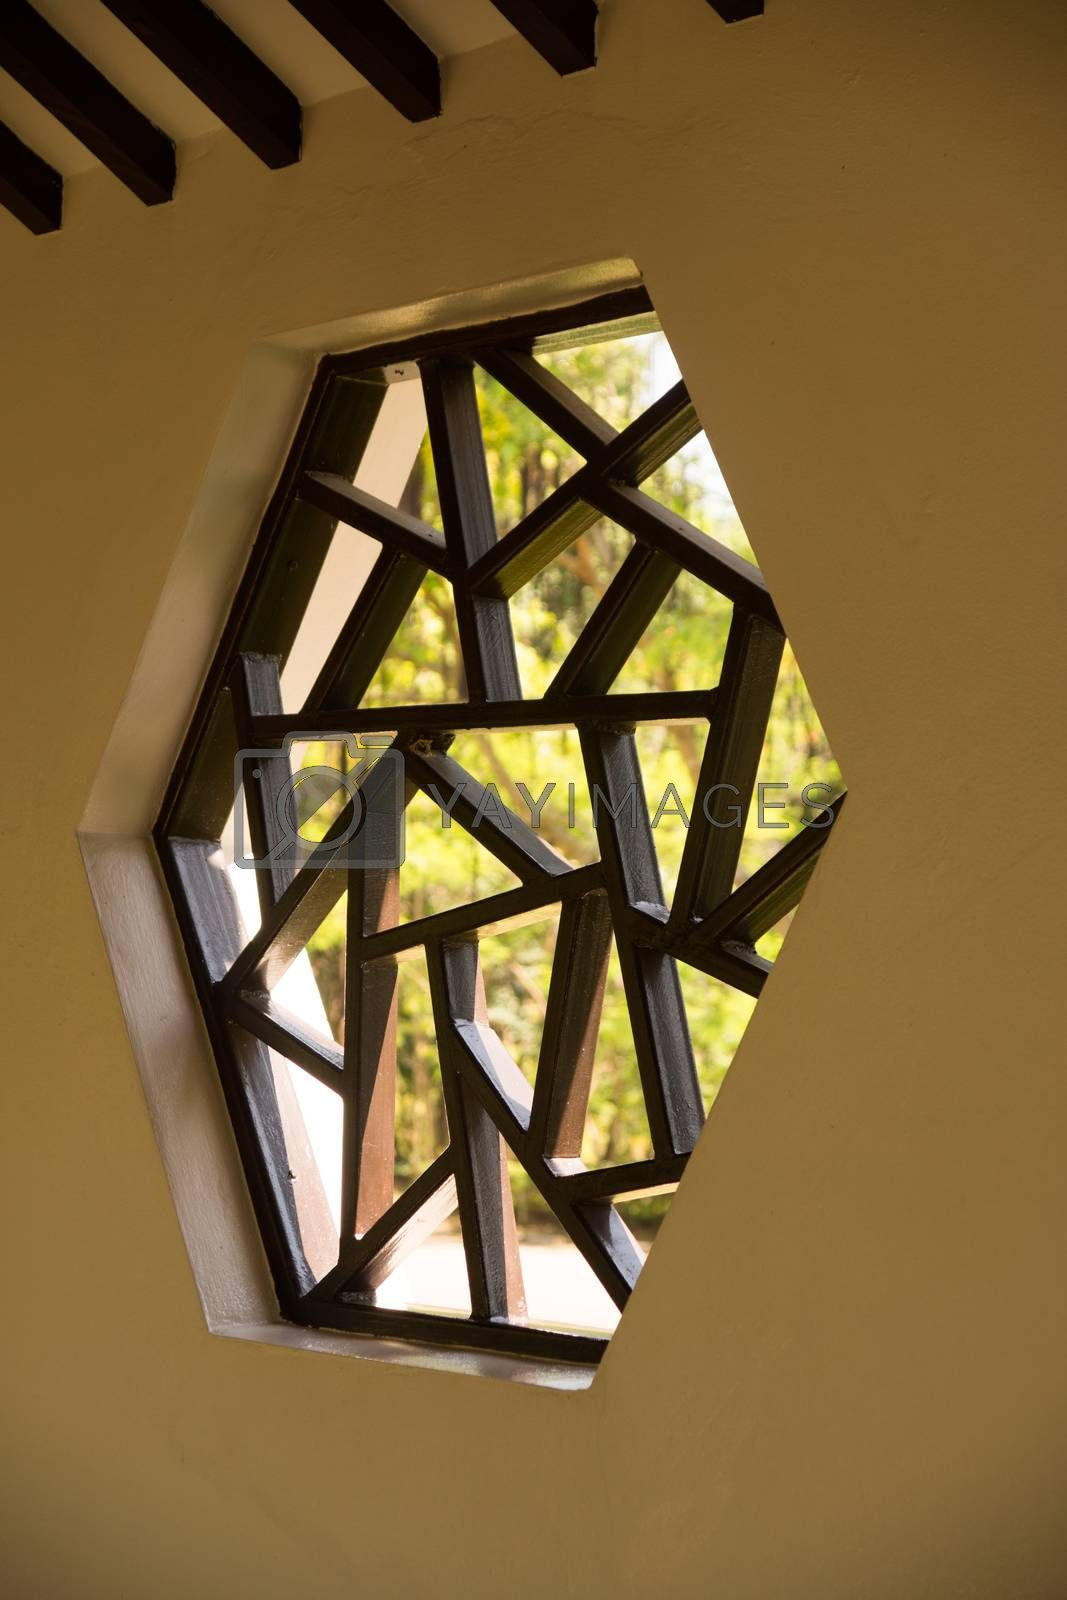 Royalty free image of chinese window by nattapatt